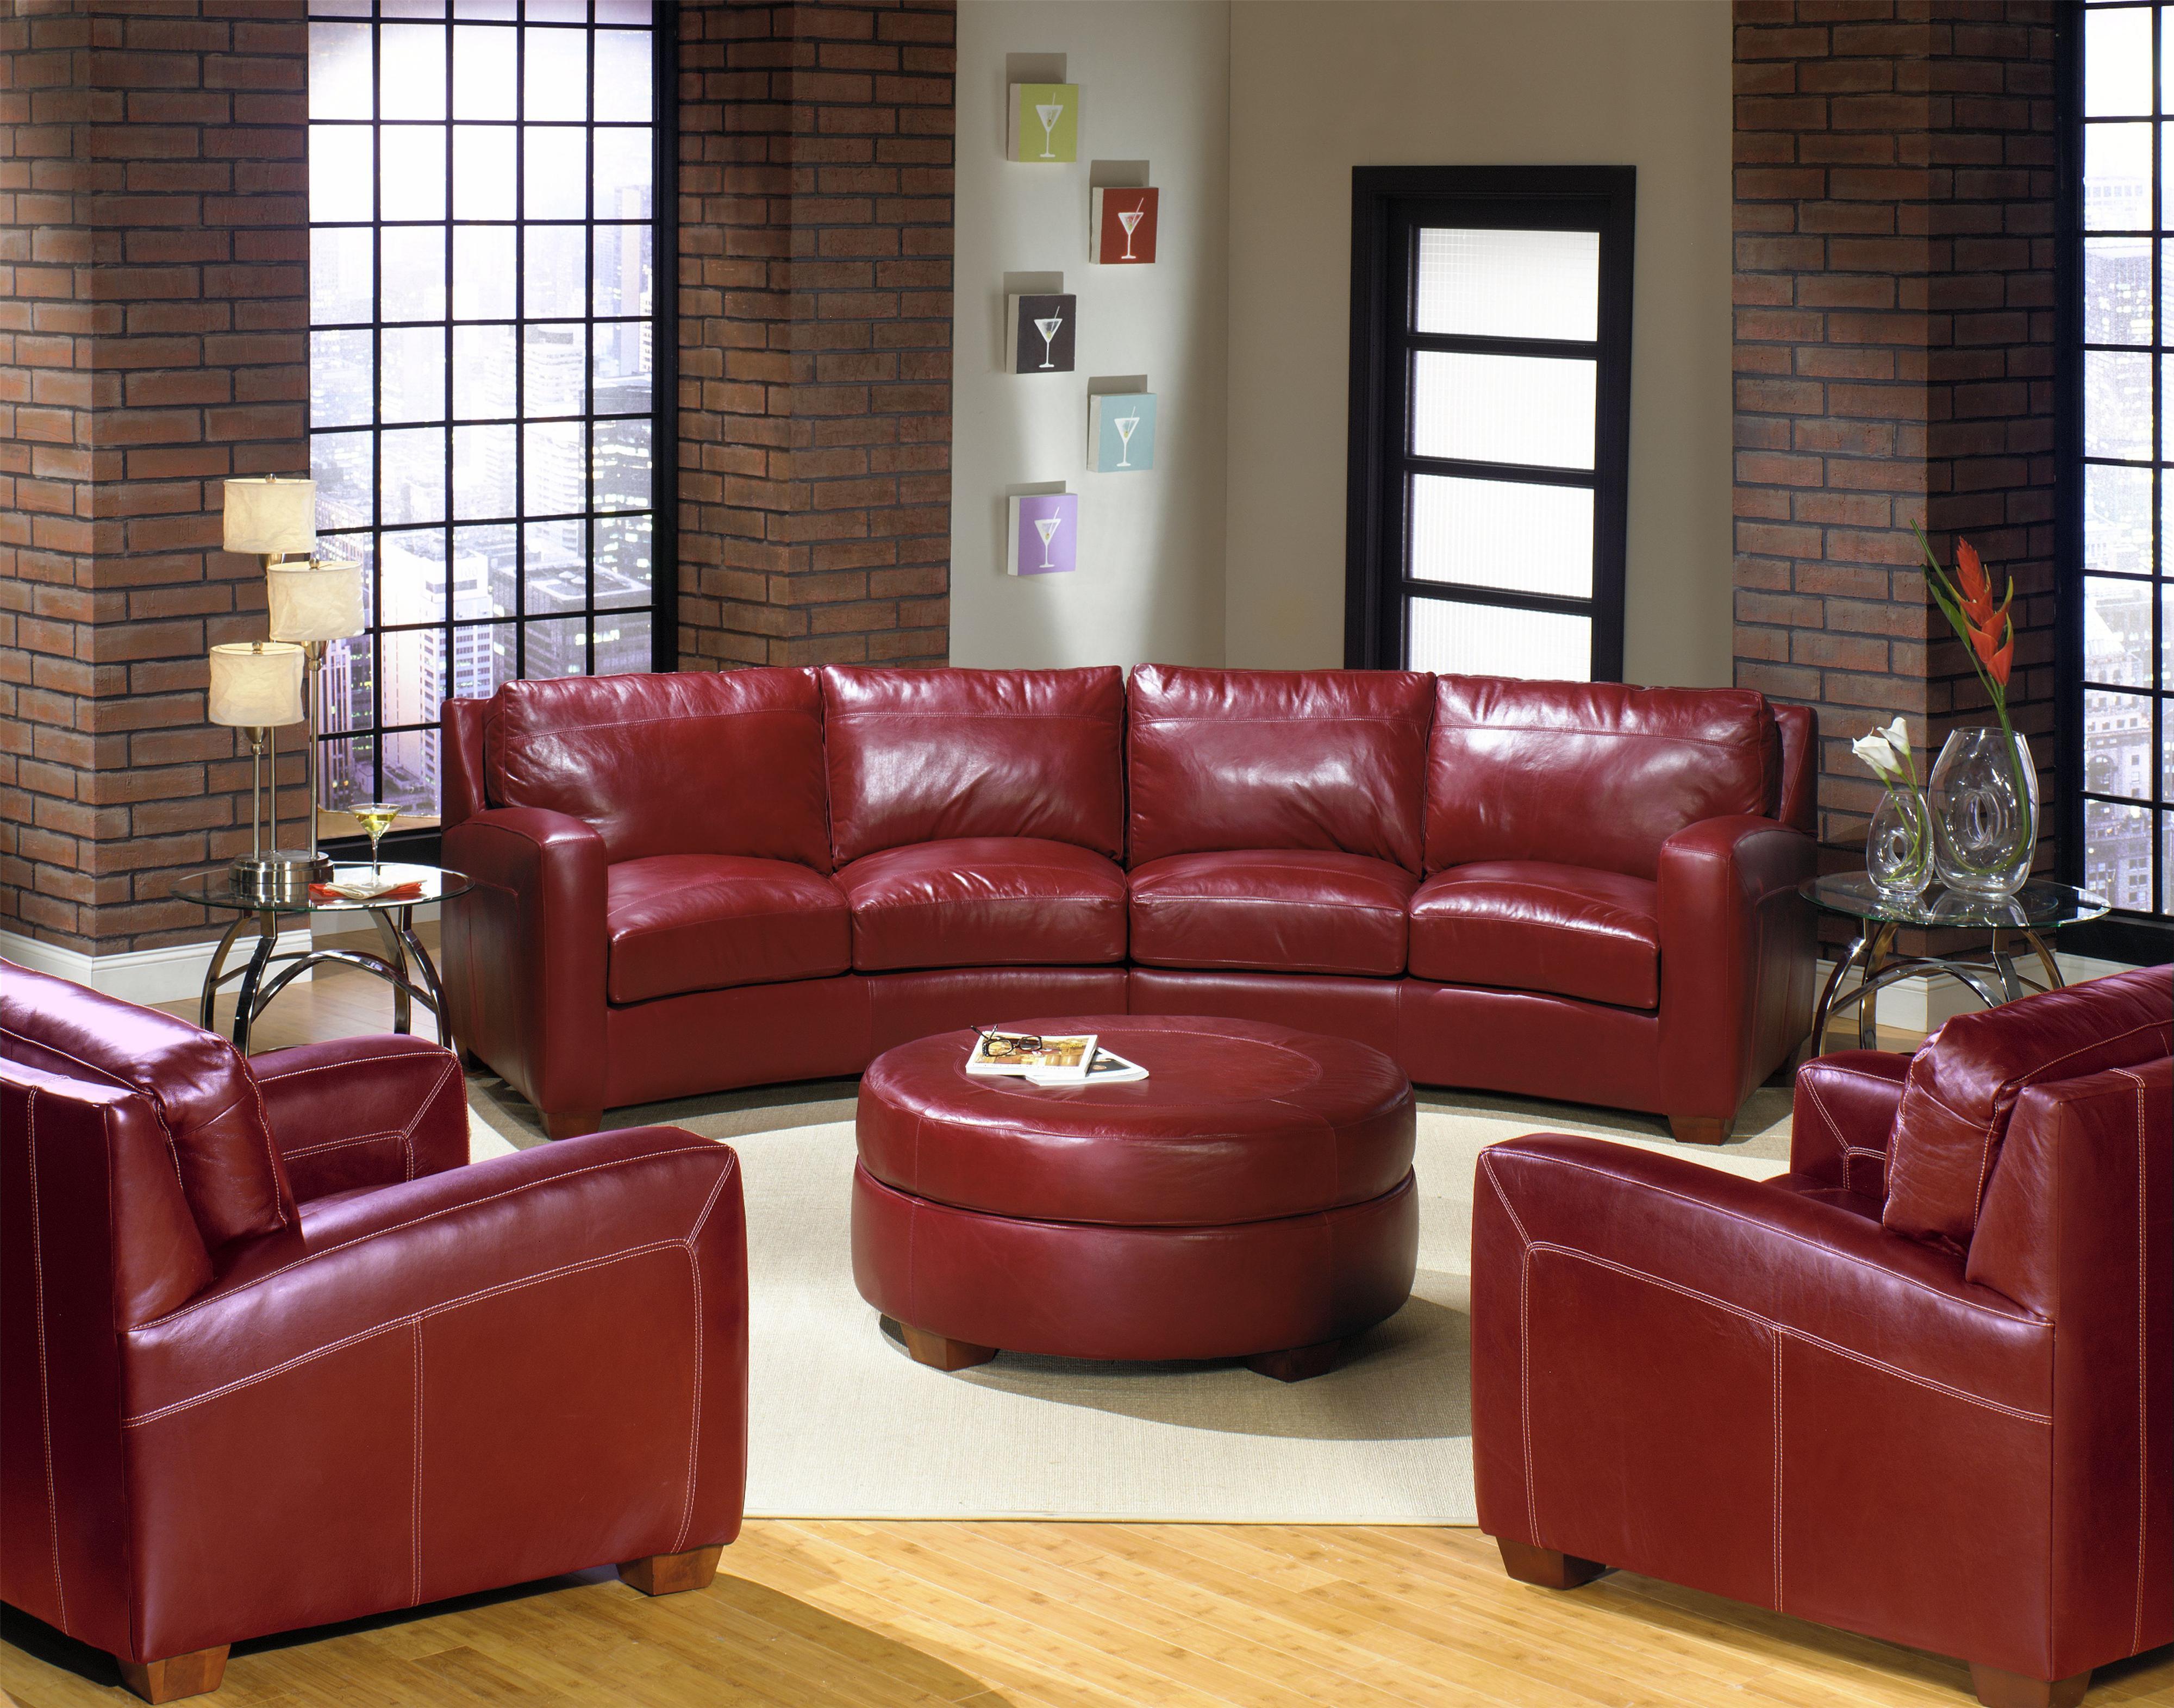 USA Premium Leather 2950 Round Leather Ottoman Wilson s